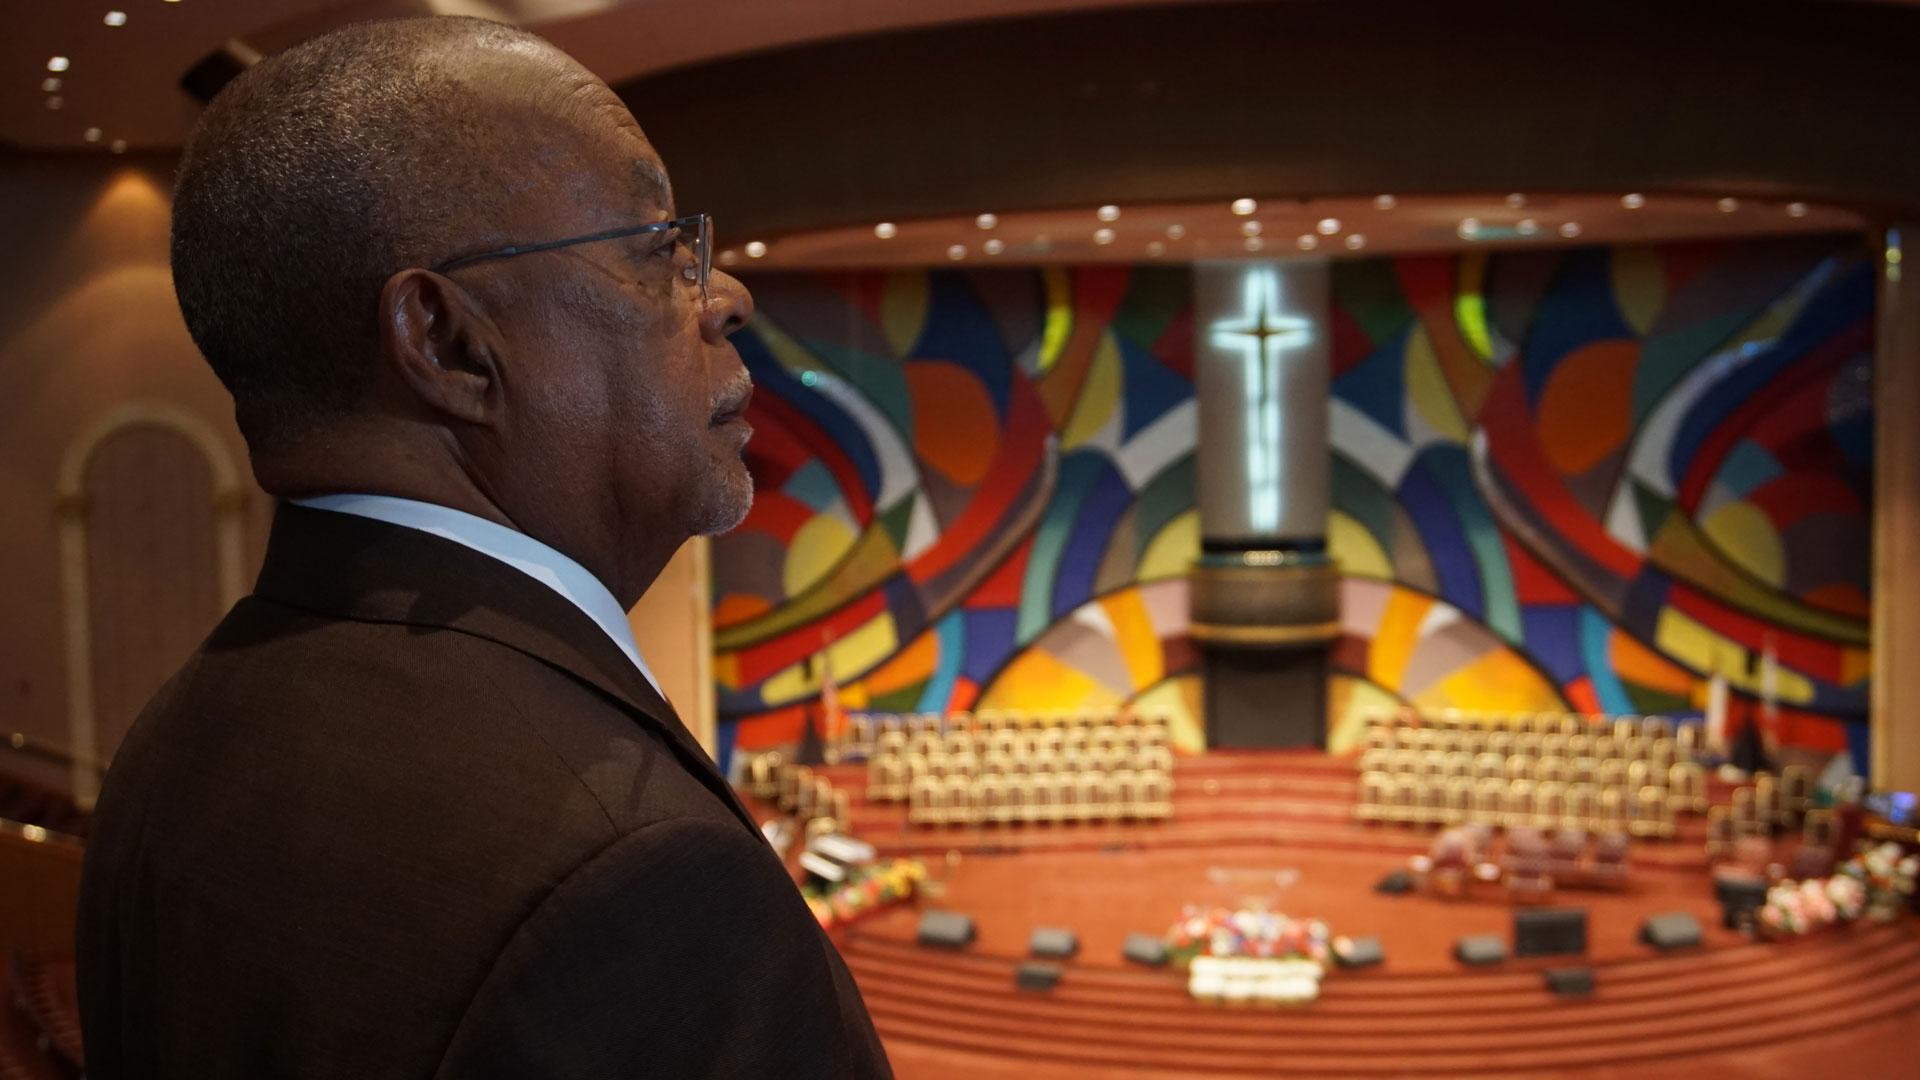 The Black Church hero1